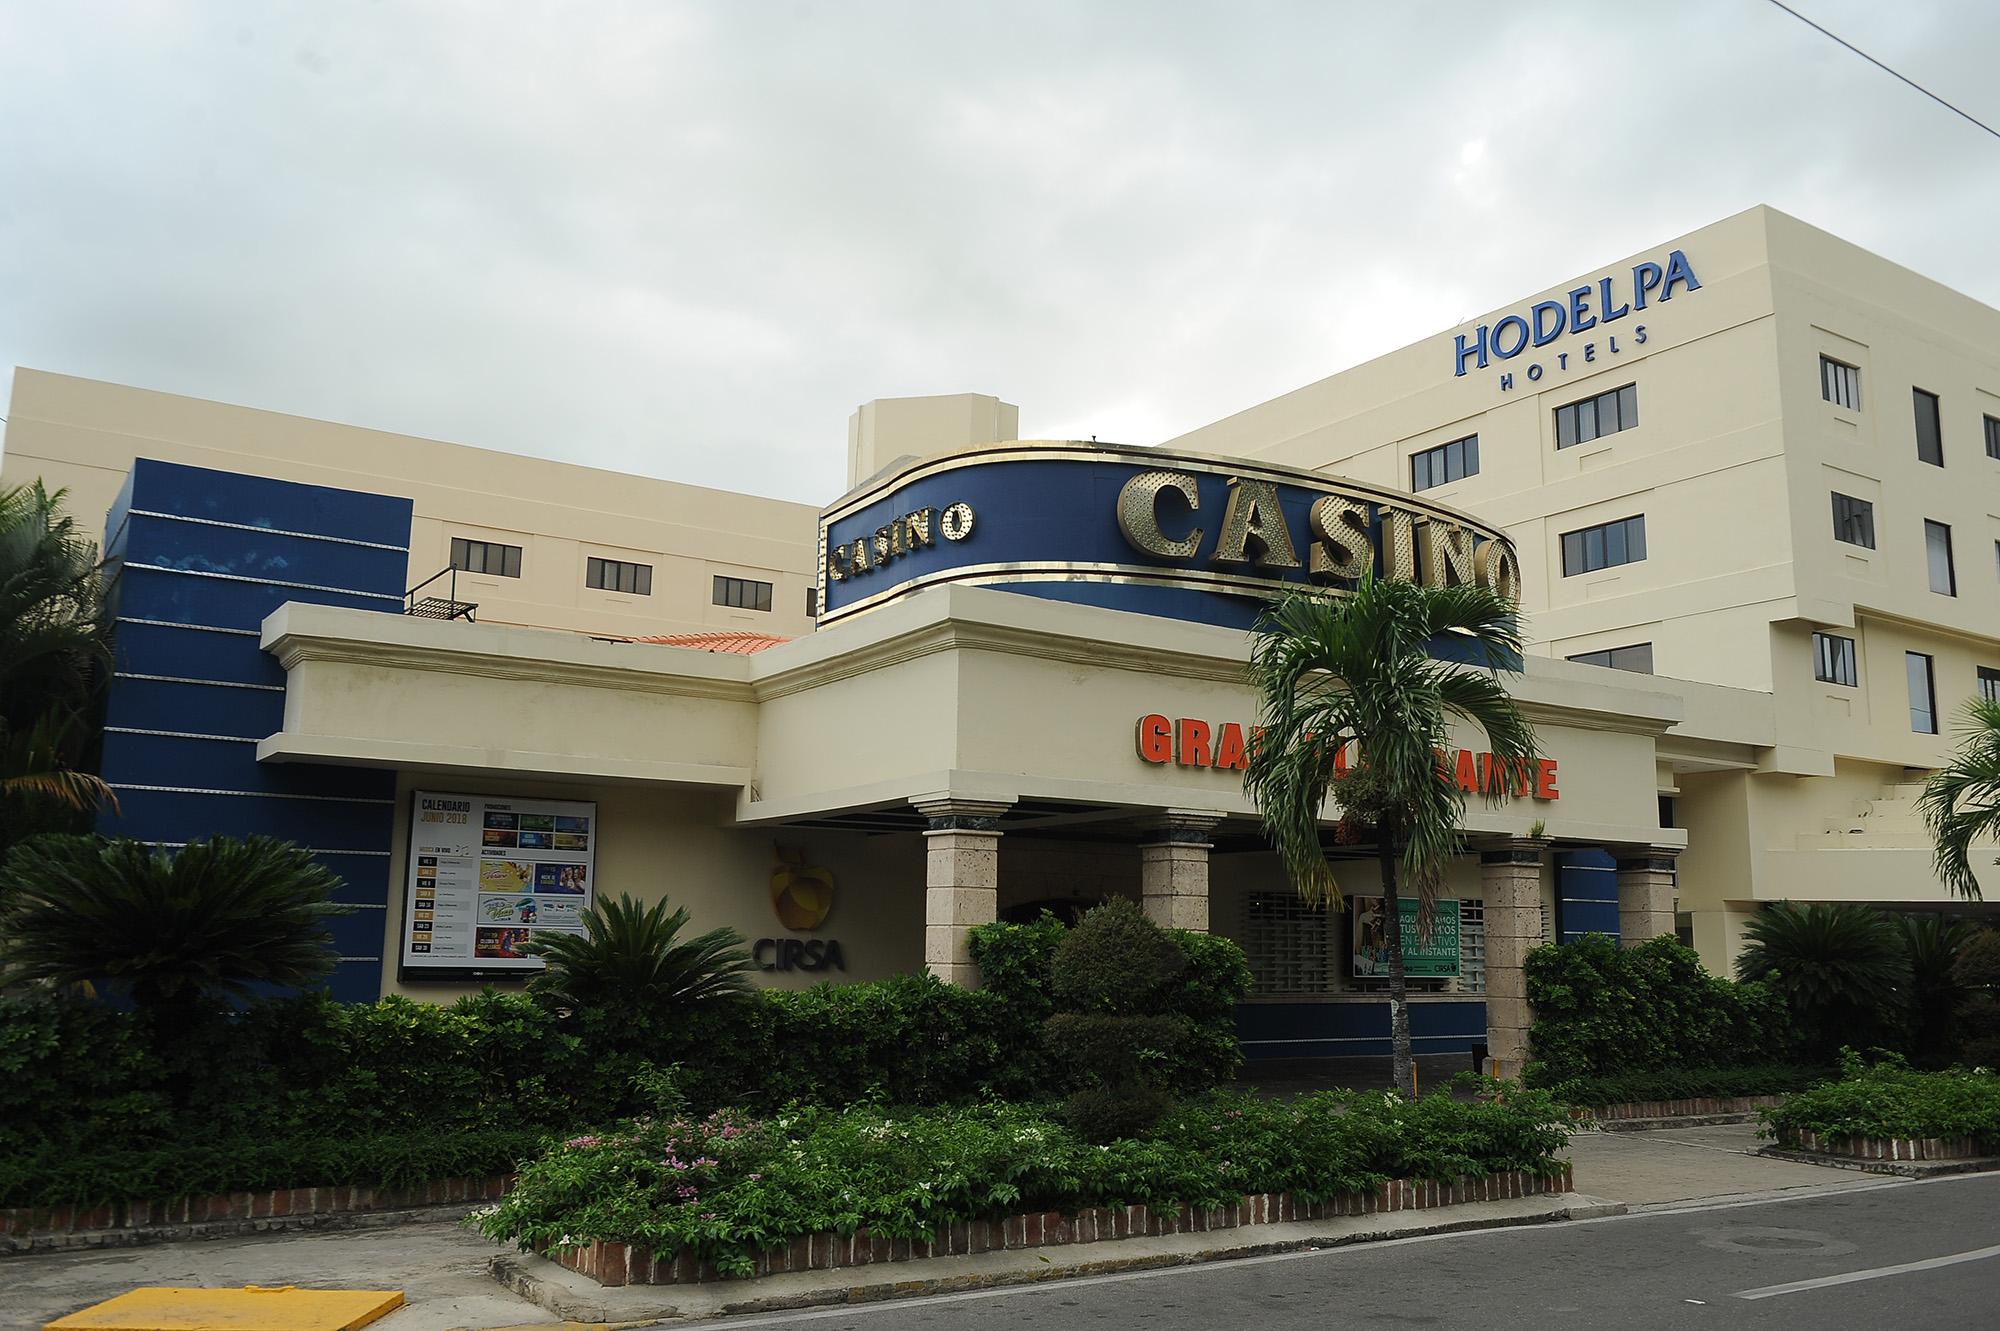 Casino Gran Almirante exterior